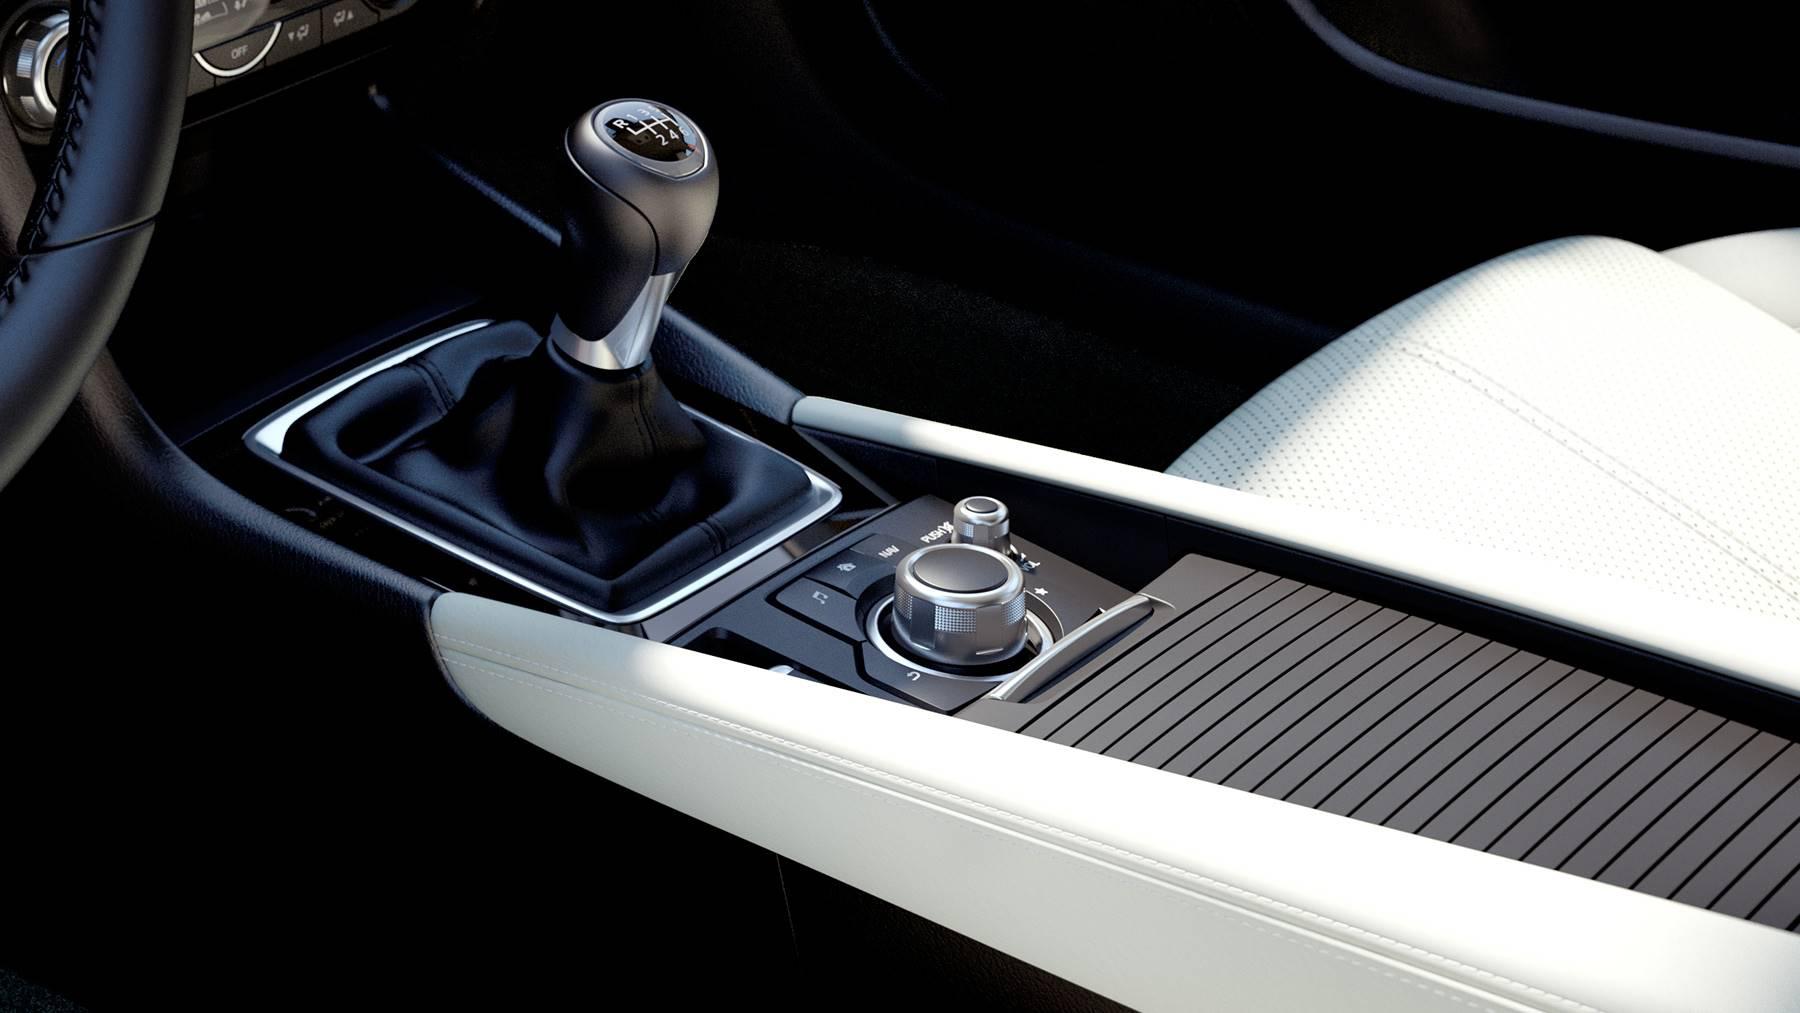 Gear Shift in the 2018 Mazda3